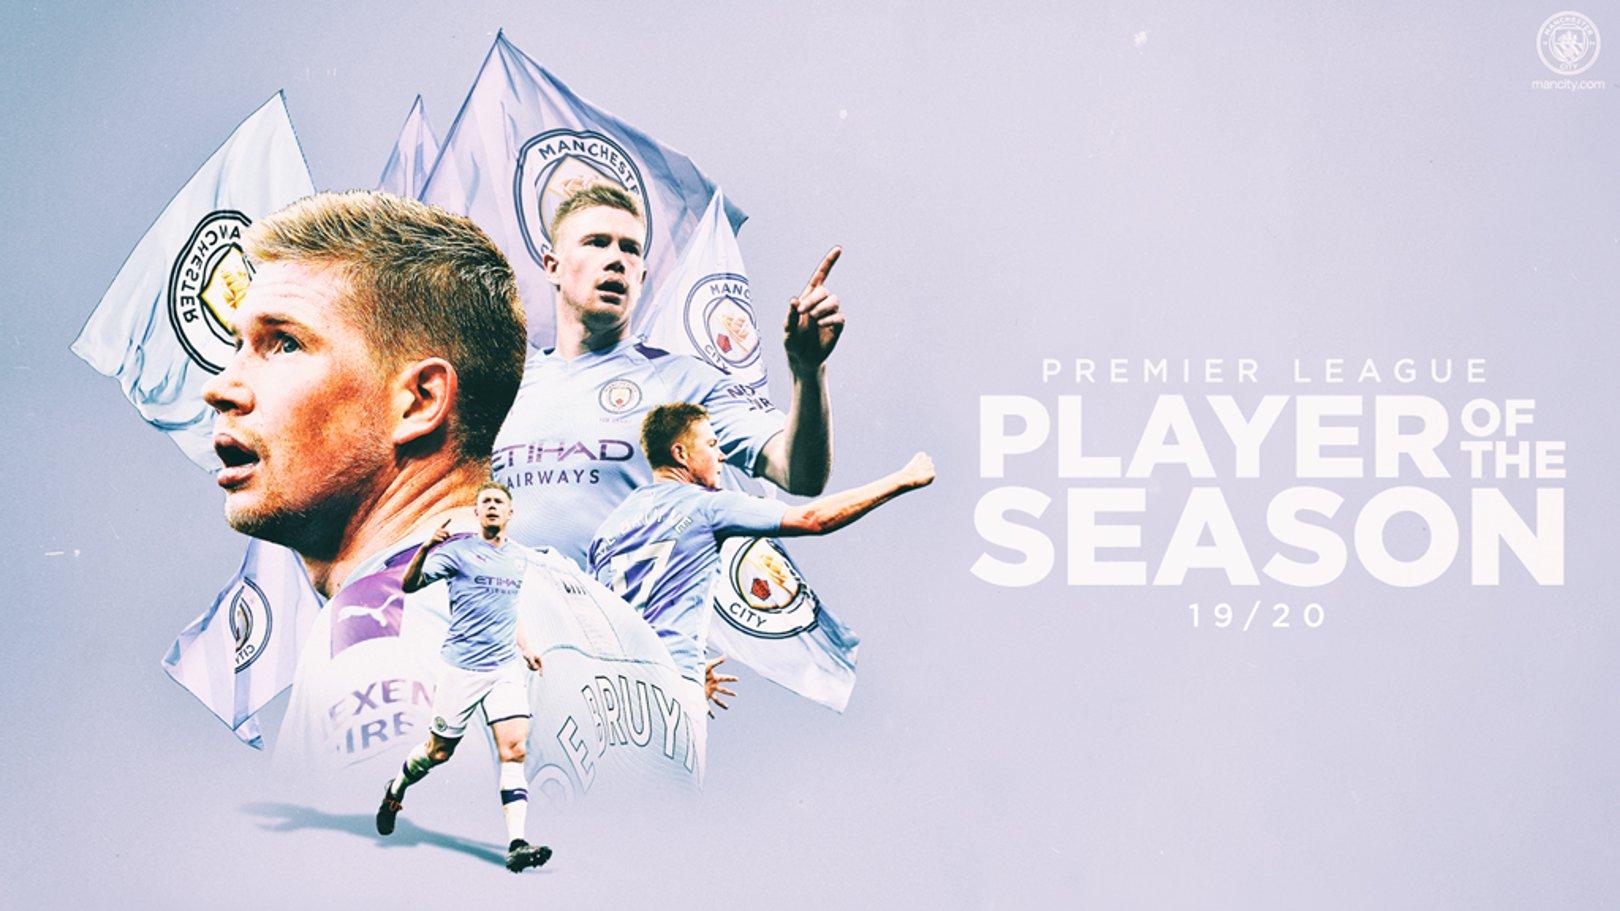 De Bruyne named Premier League Player of the Season